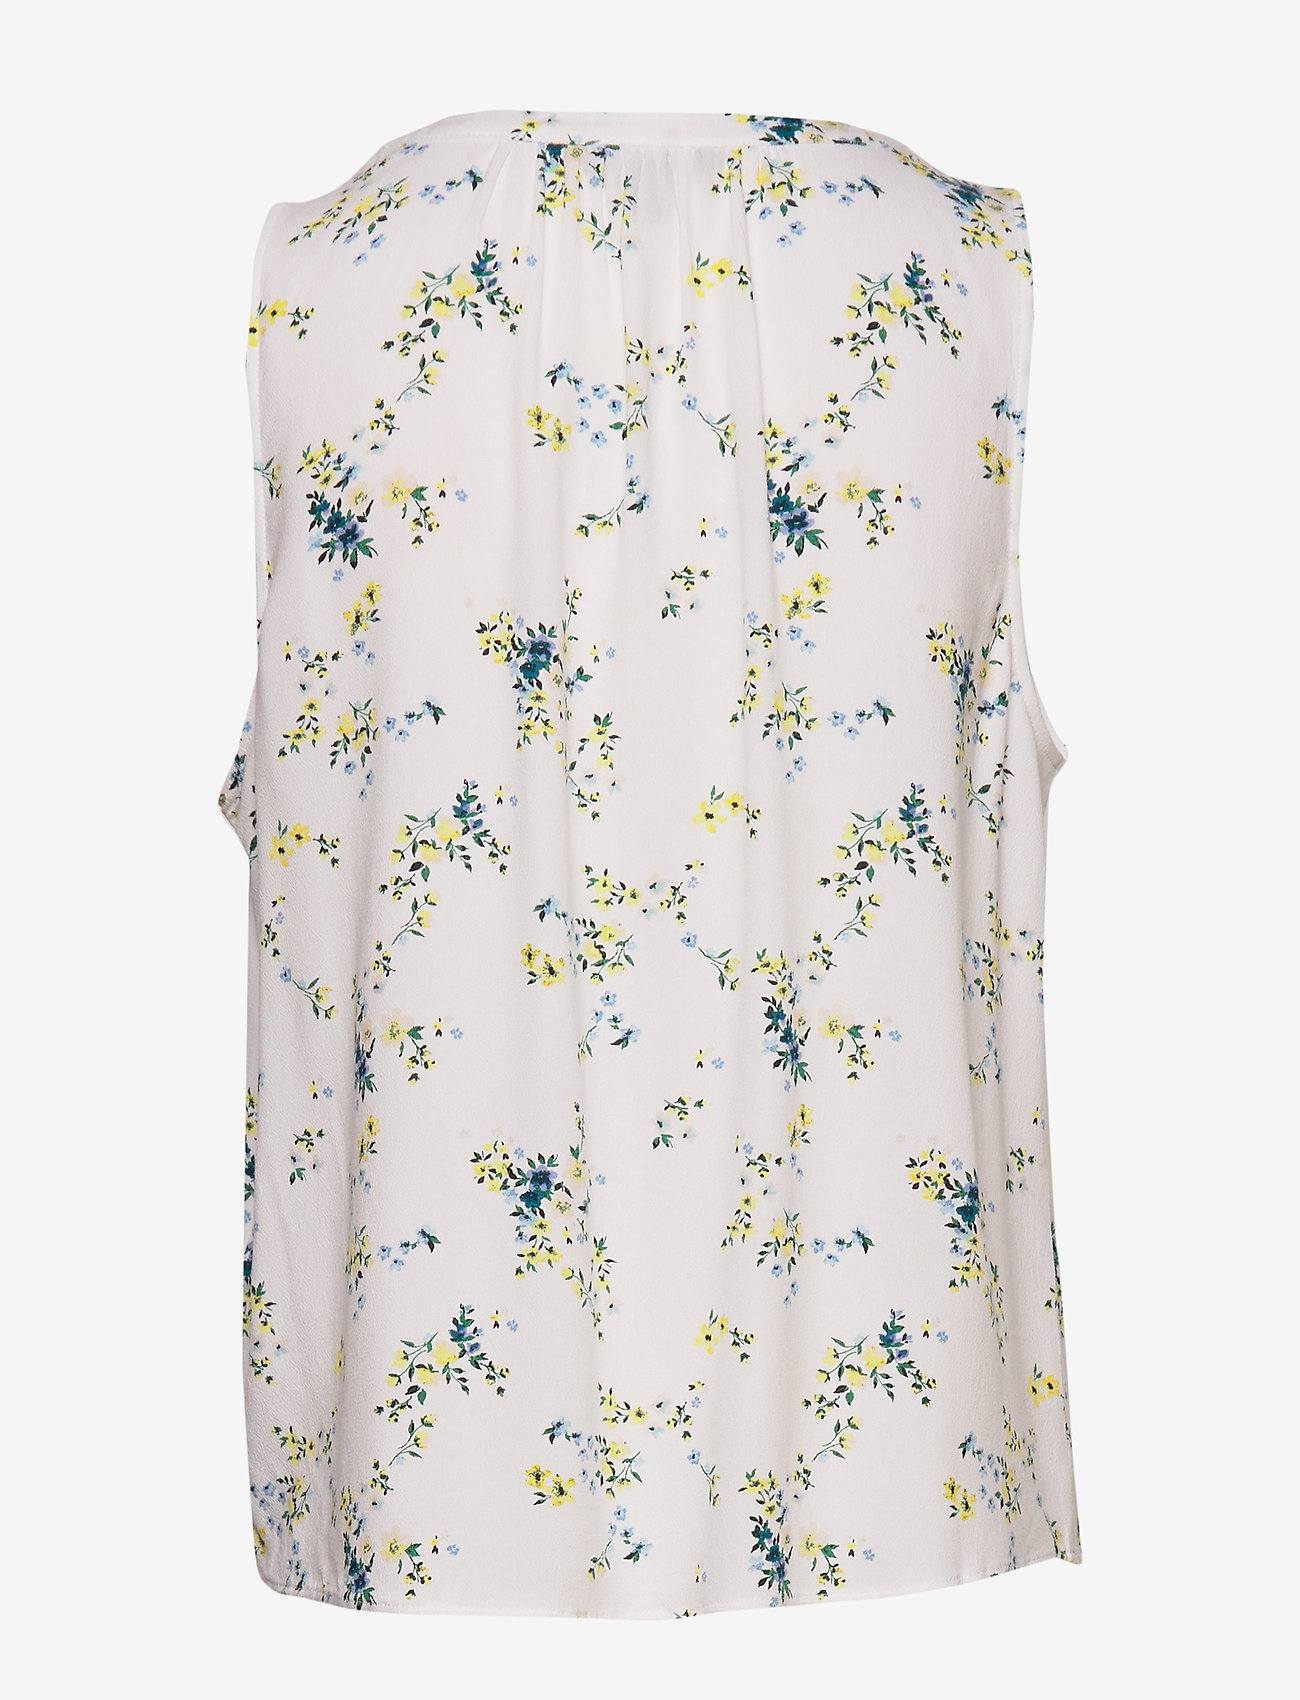 Banana Republic Ecovero™ Sleeveless Top - Blouses & Shirts